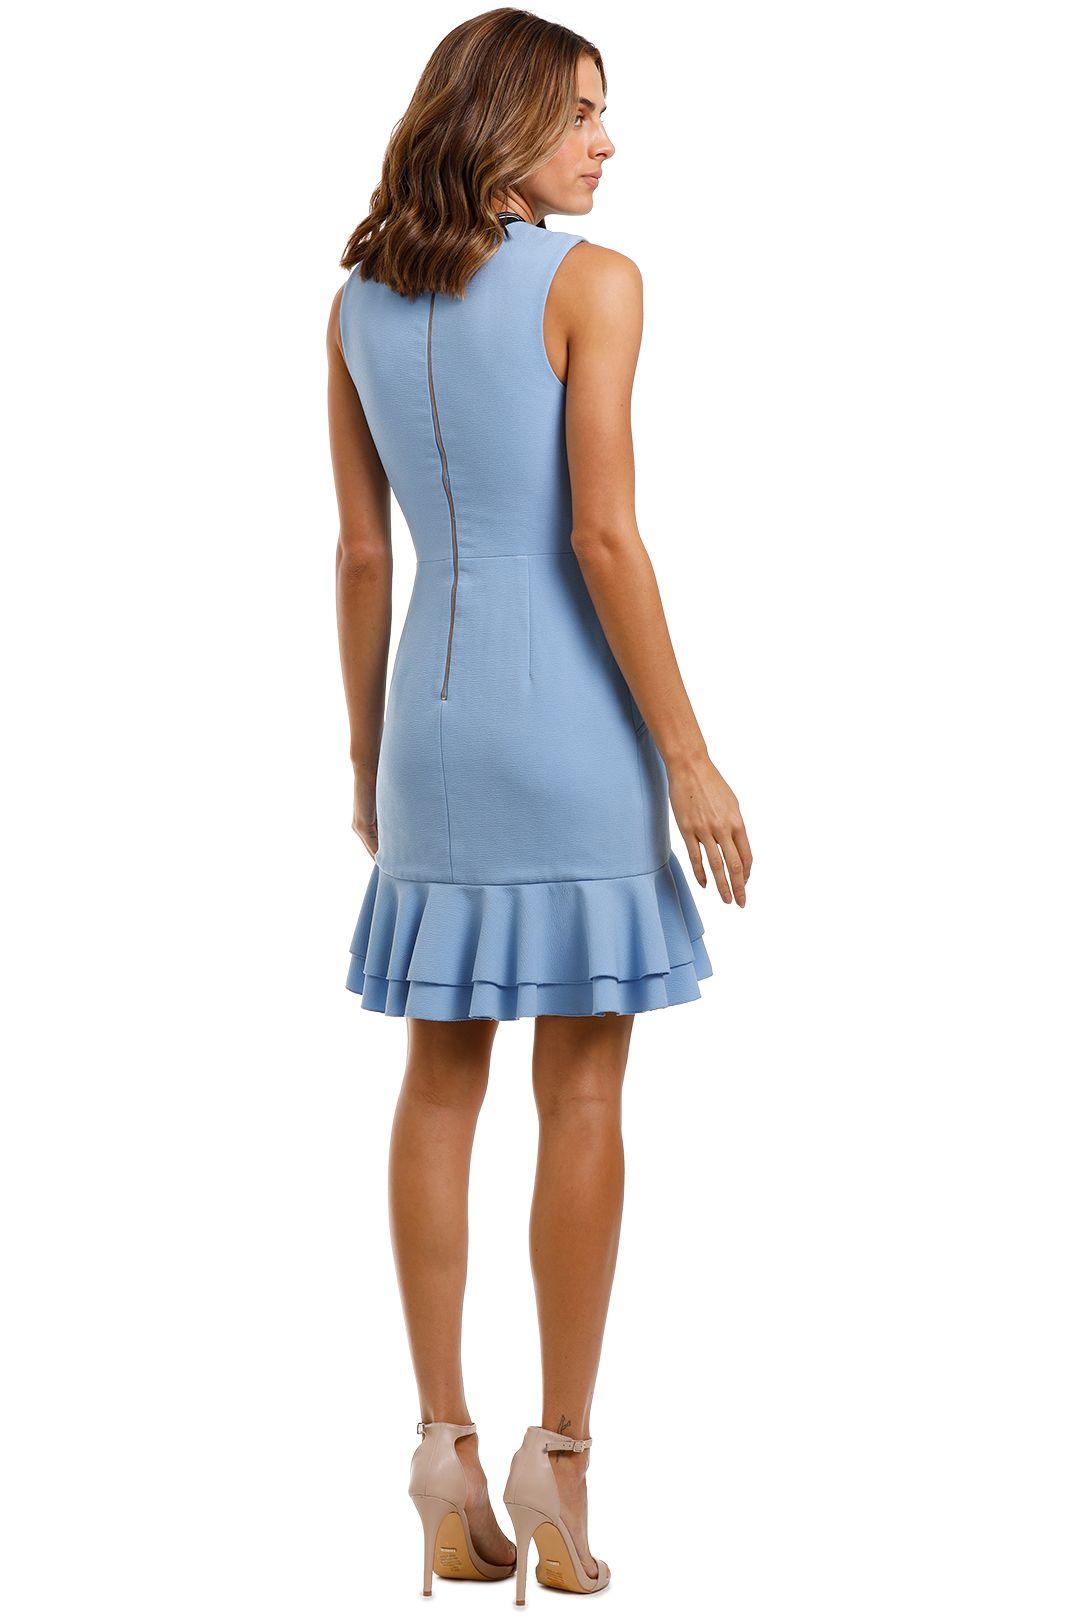 Rebecca Vallance Yves Mini Dress Blue Zip Closure